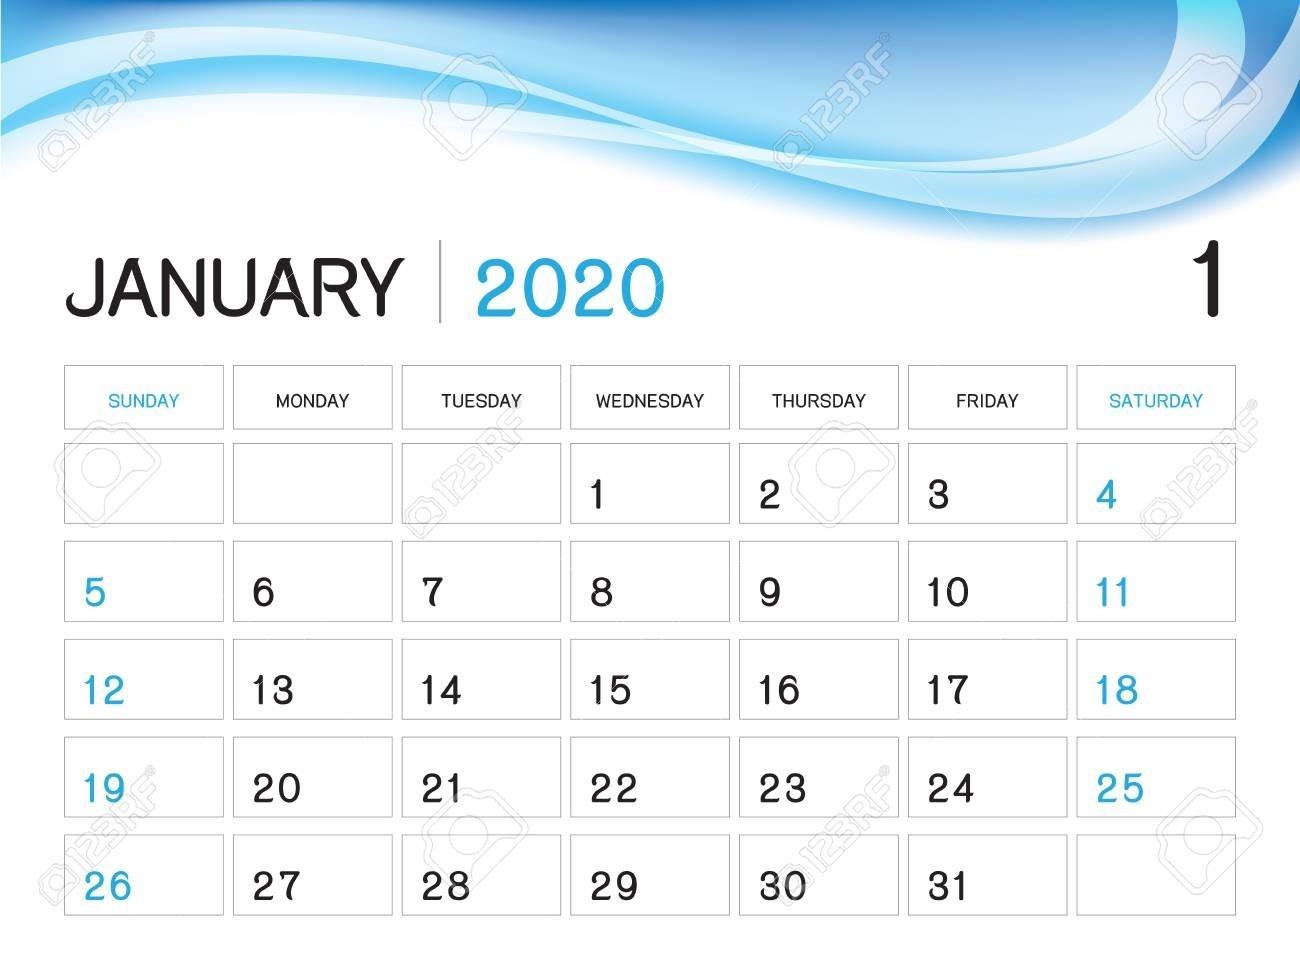 January 2020 Year Template, Calendar 2020 Vector, Desk Calendar..-January 2020 Yearly Calendar